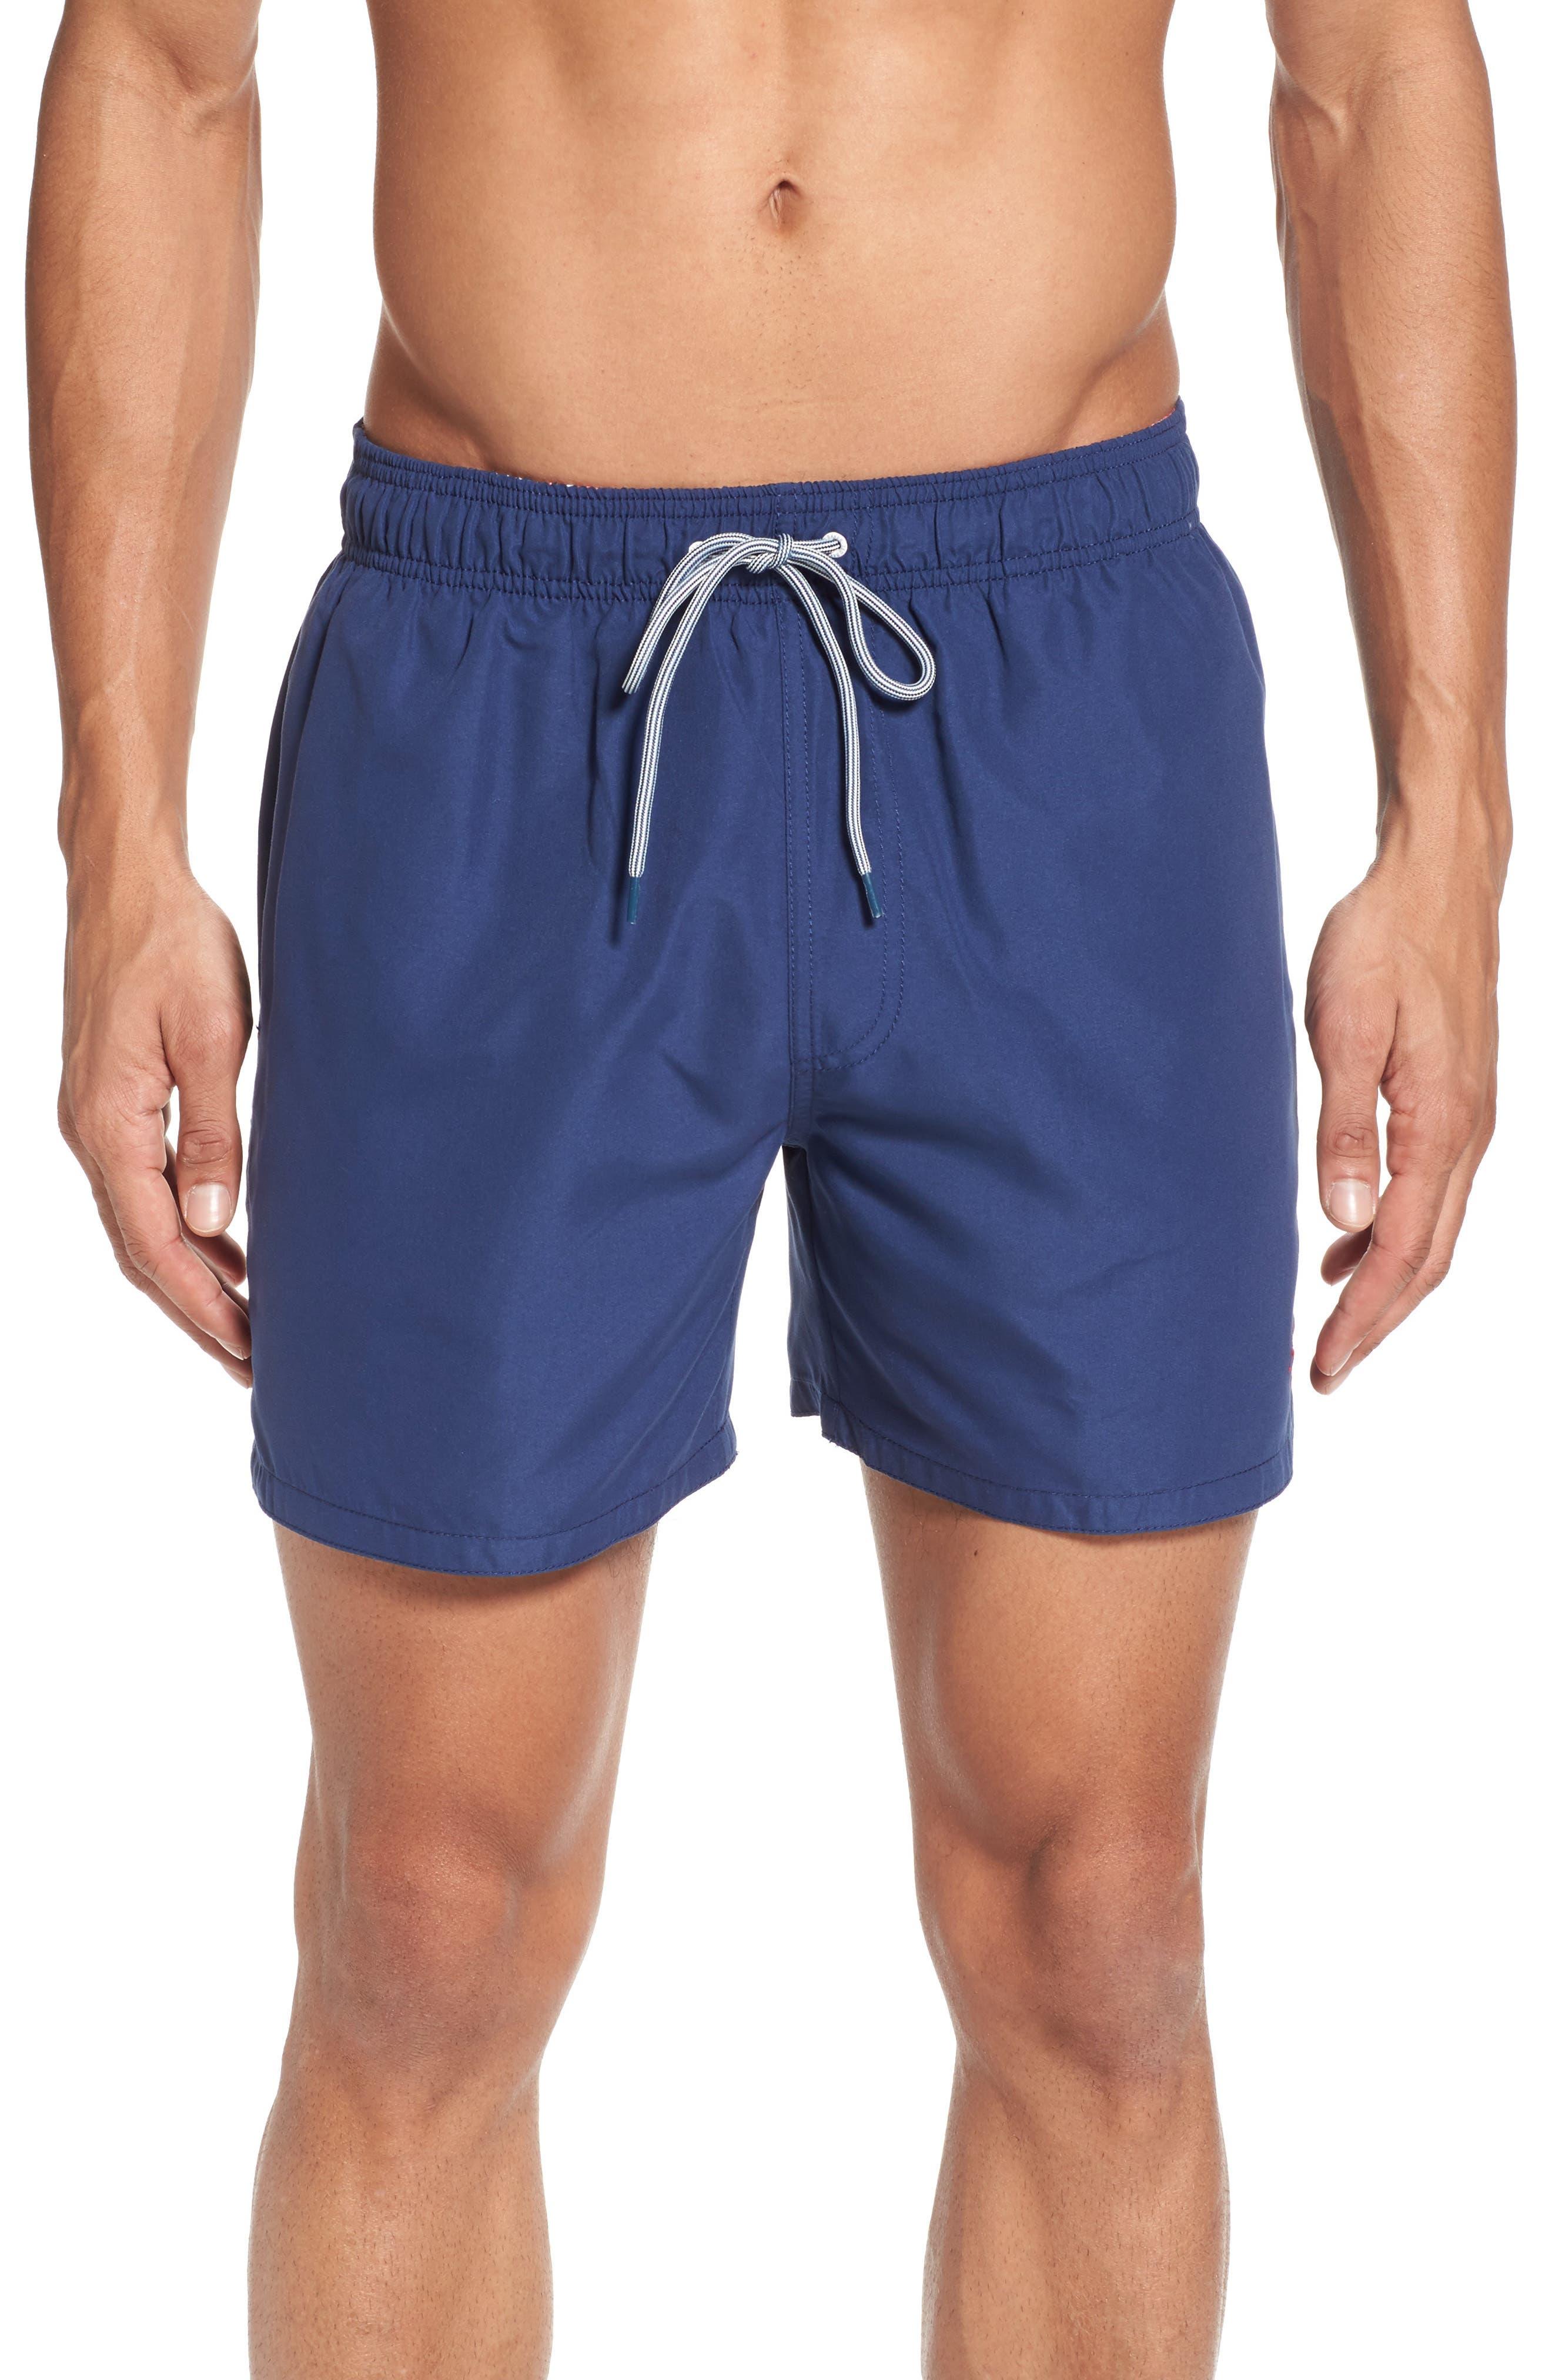 Alternate Image 1 Selected - Ted Baker London Danbury Swim Shorts